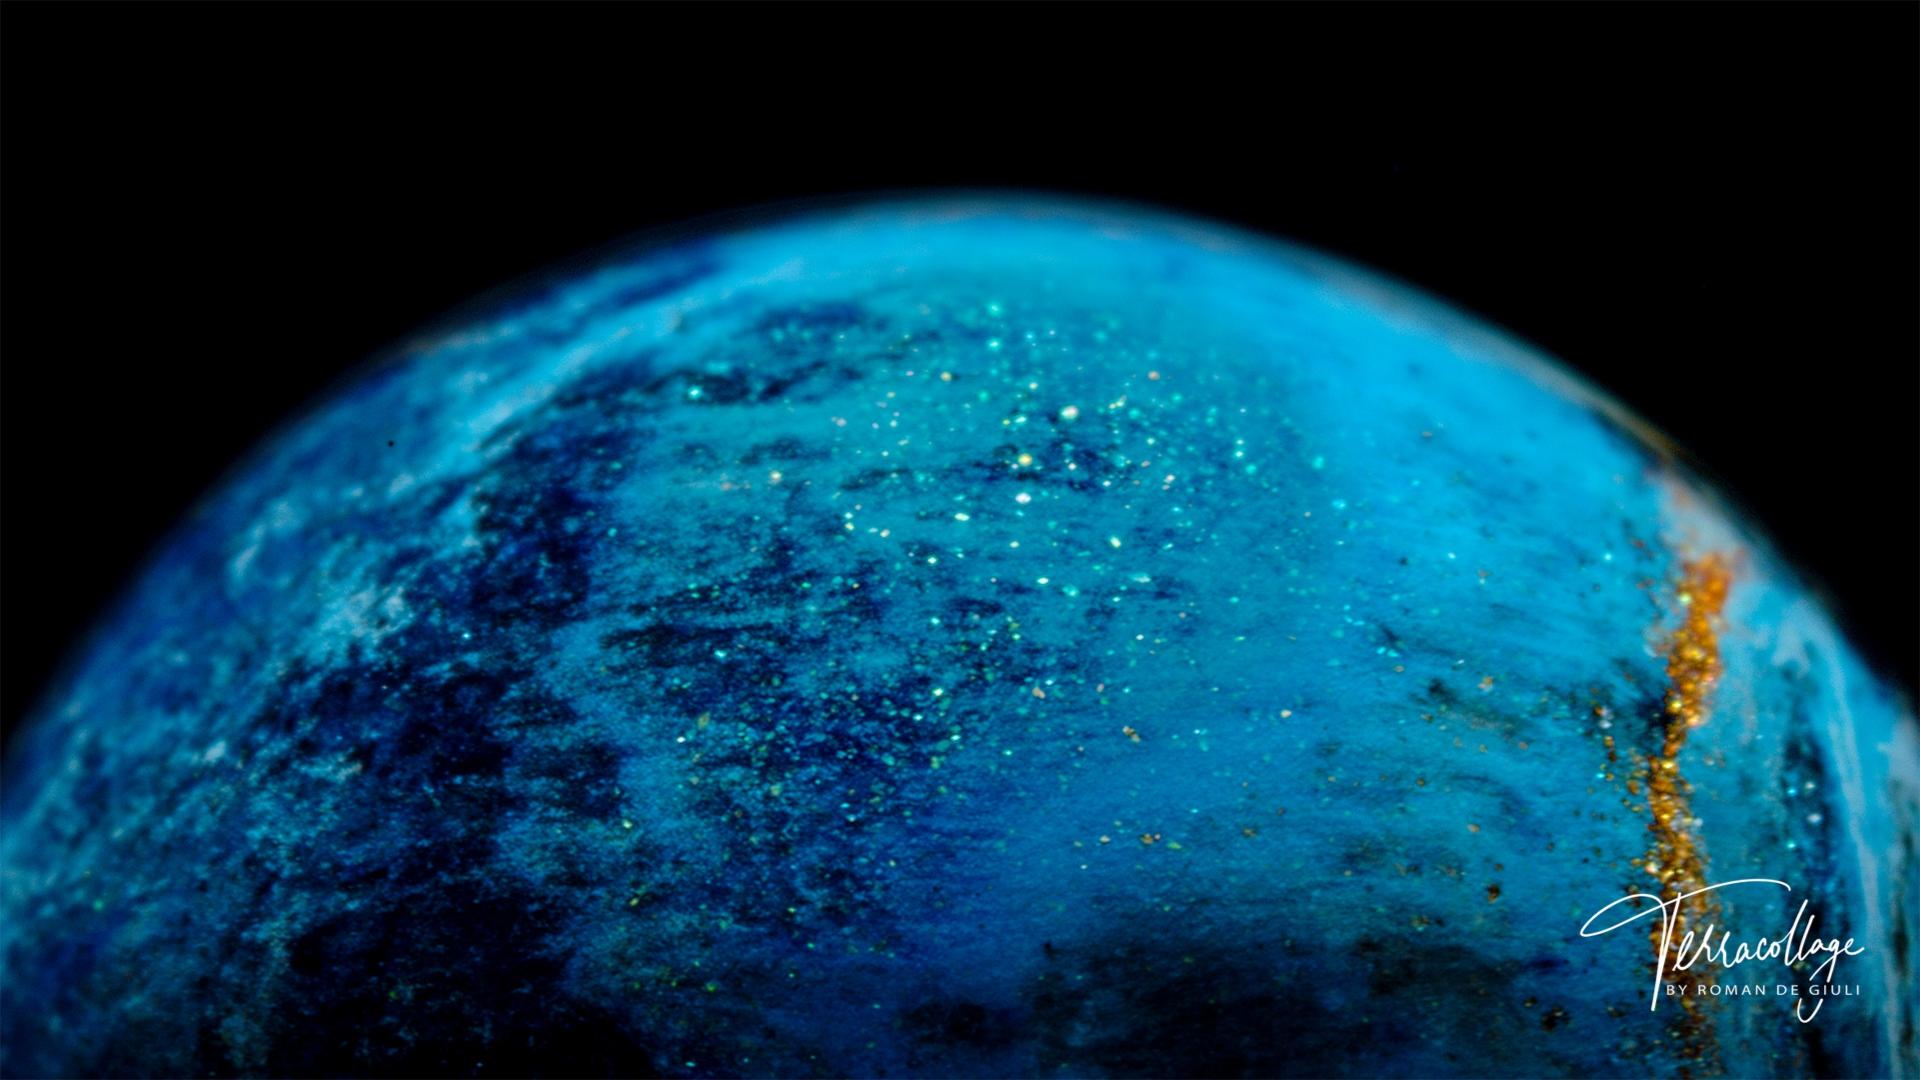 Terracollage SIGMA Starlit - terracollage 8k hdr macro colors by roman de giuli